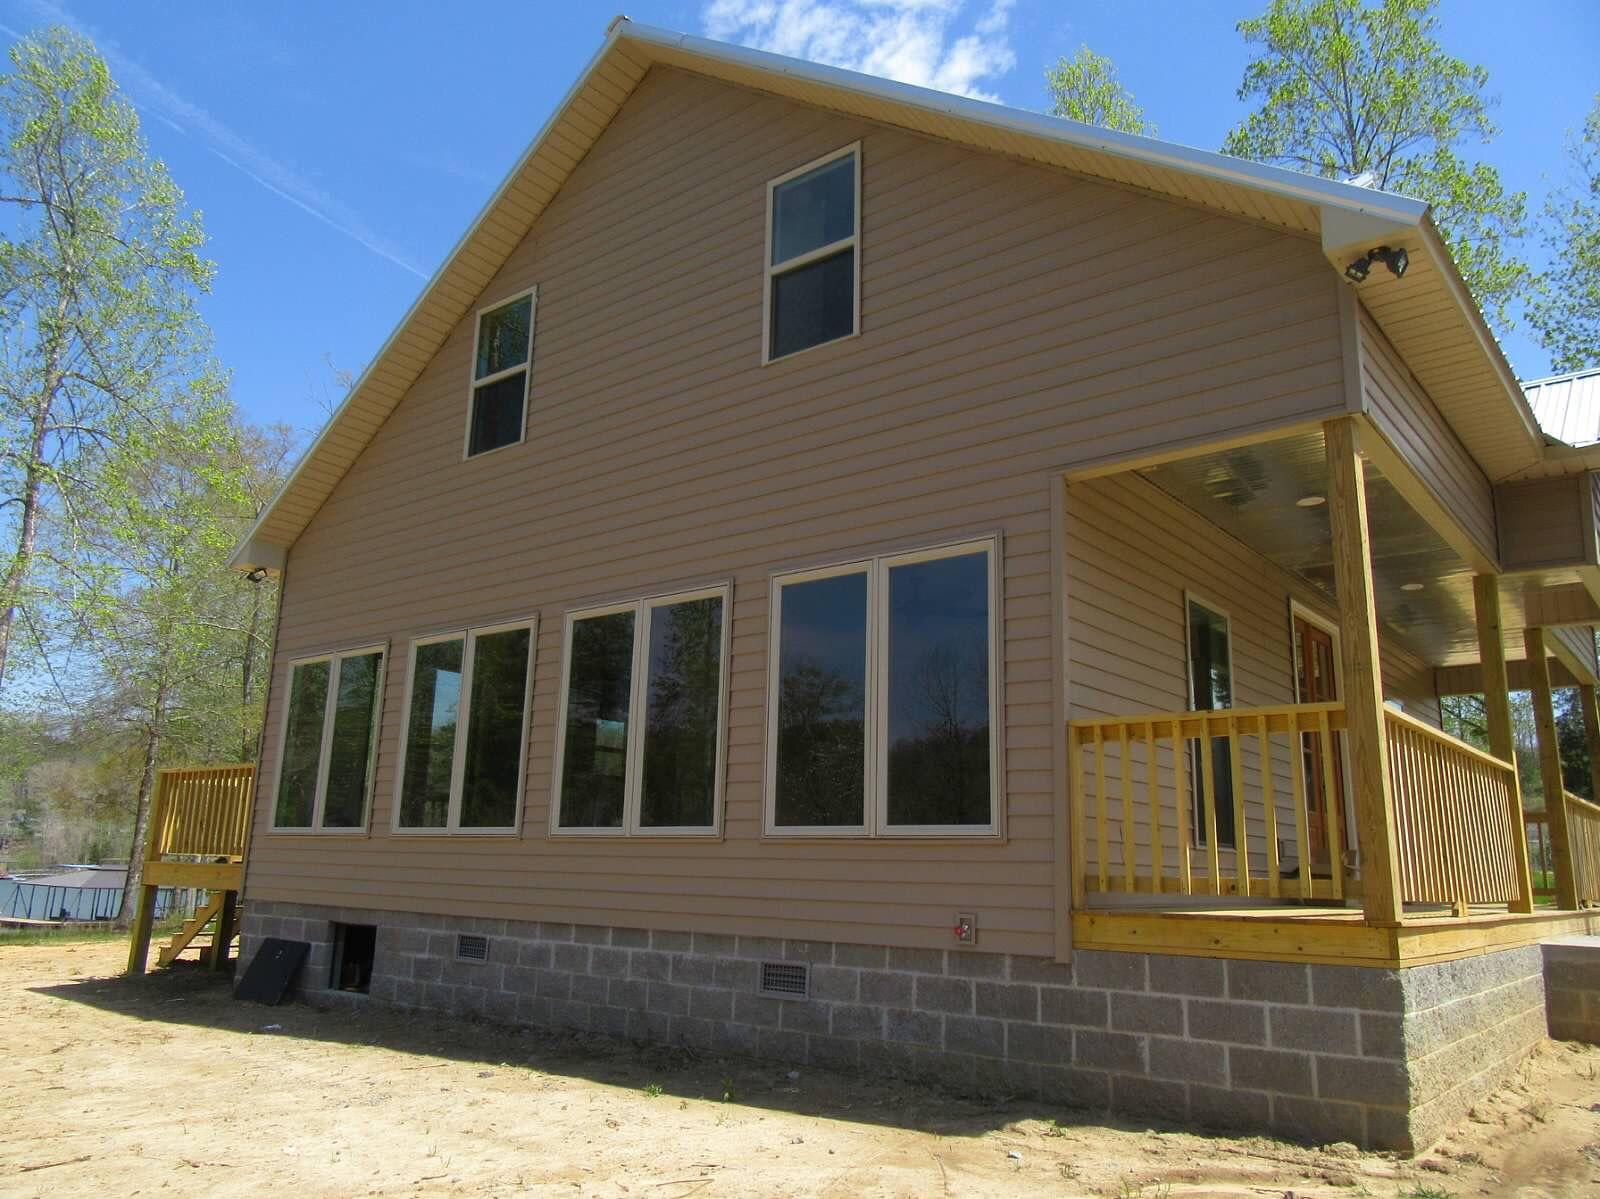 Eric thweatt construction for sale on lewis smith lake